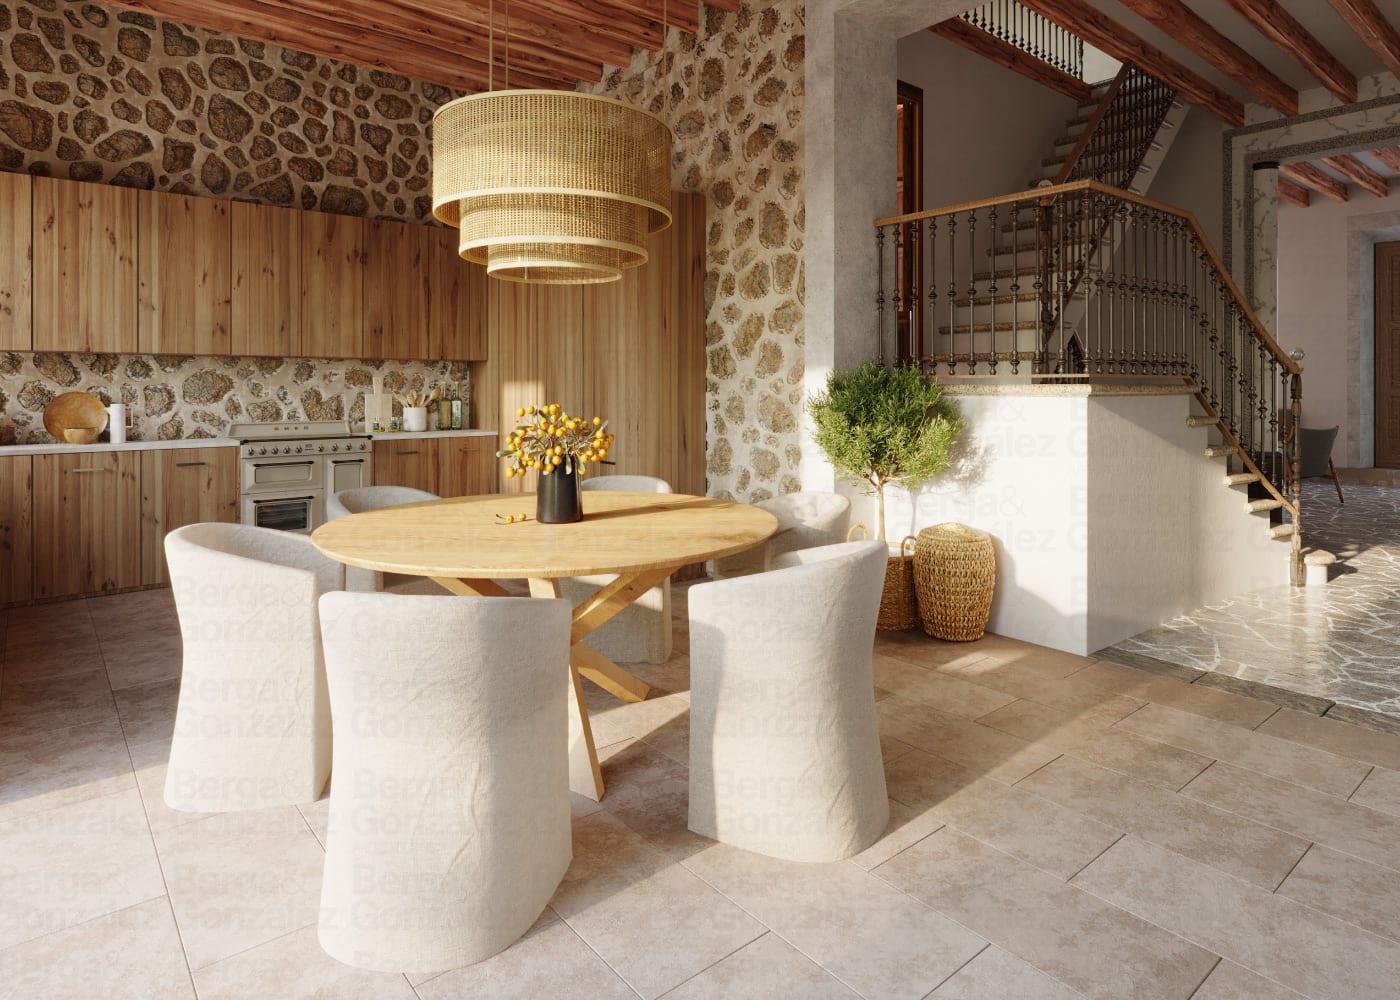 Casa-Mares-Property-Mallorca-Berrow-Projects-10-2